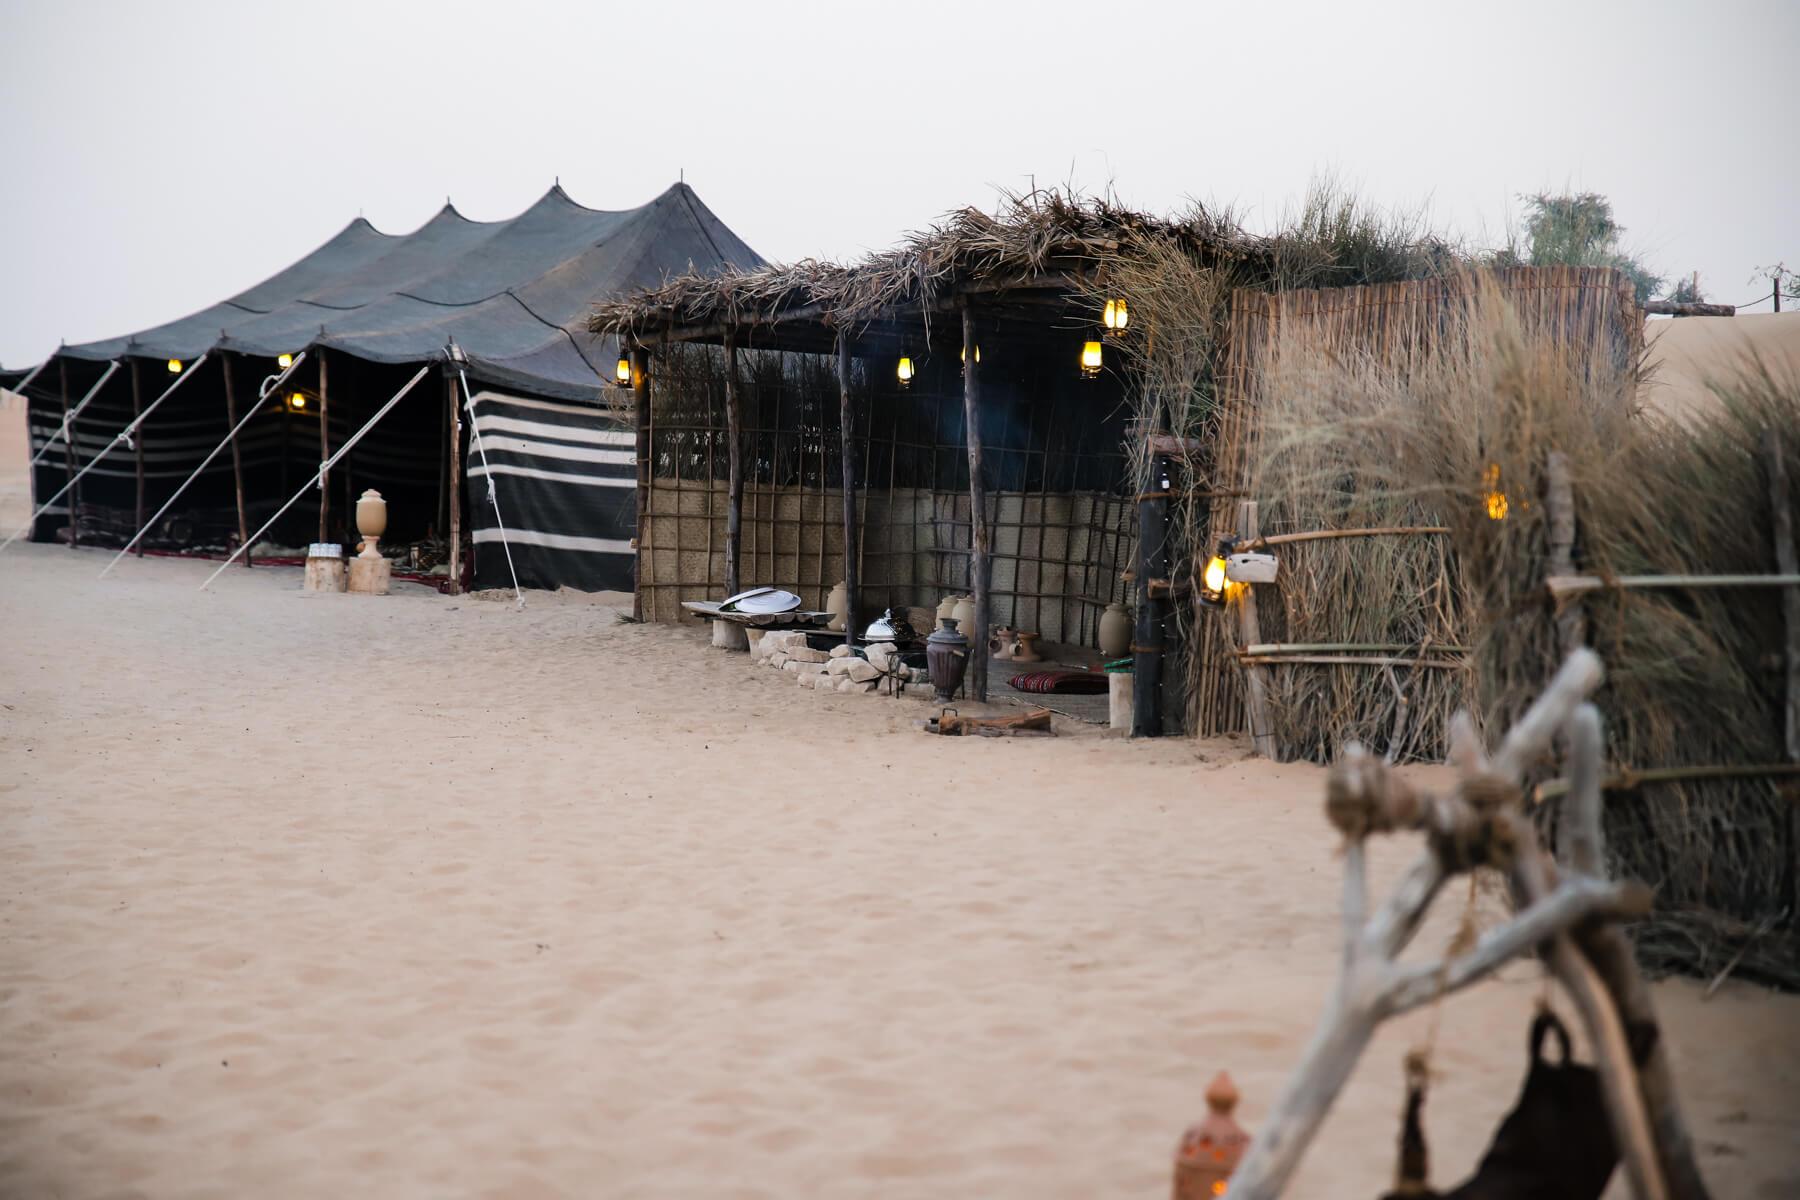 Al Marmoom Bedouin Culture Experience